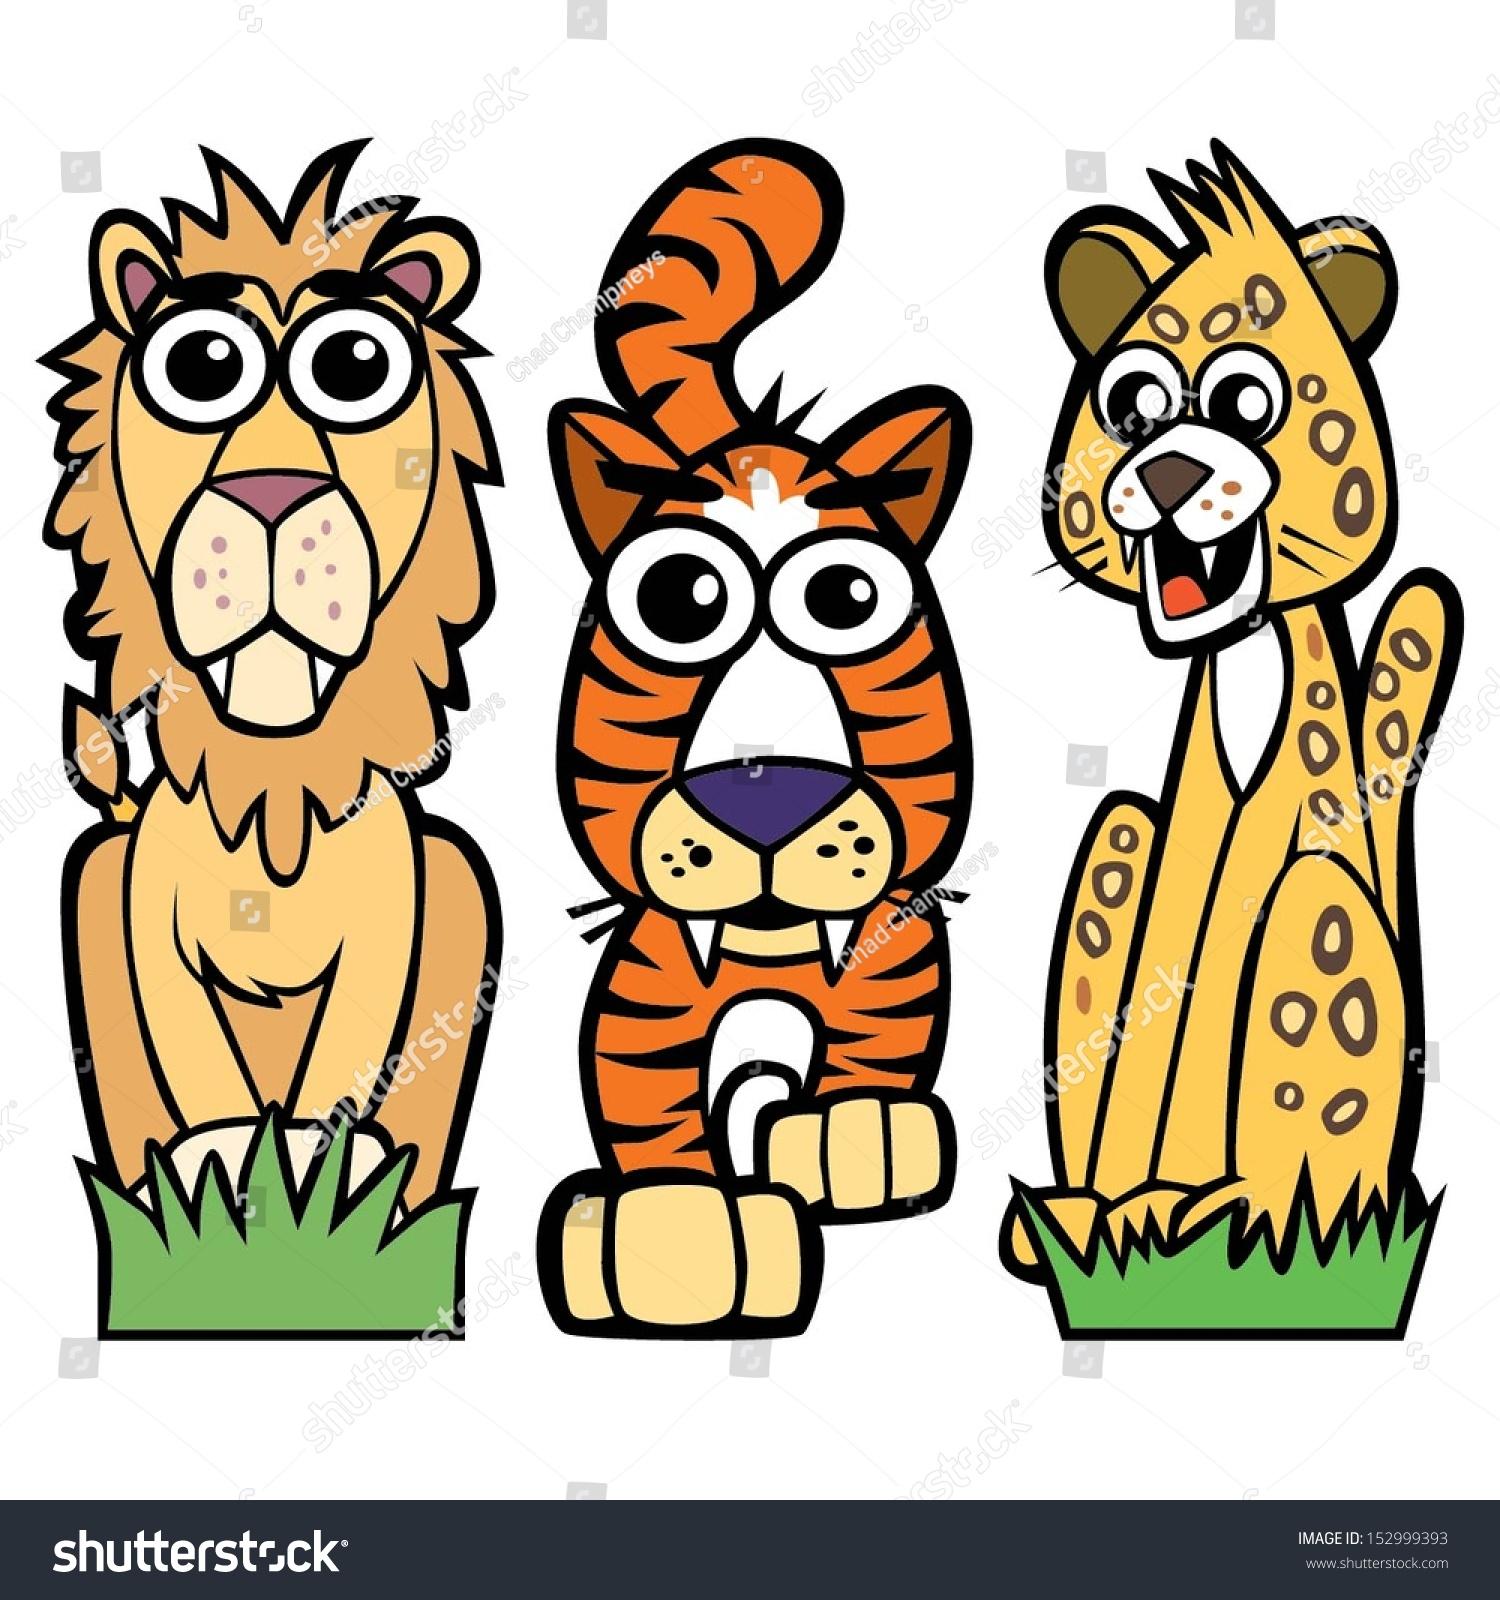 Image Gallery lion cartoon cats